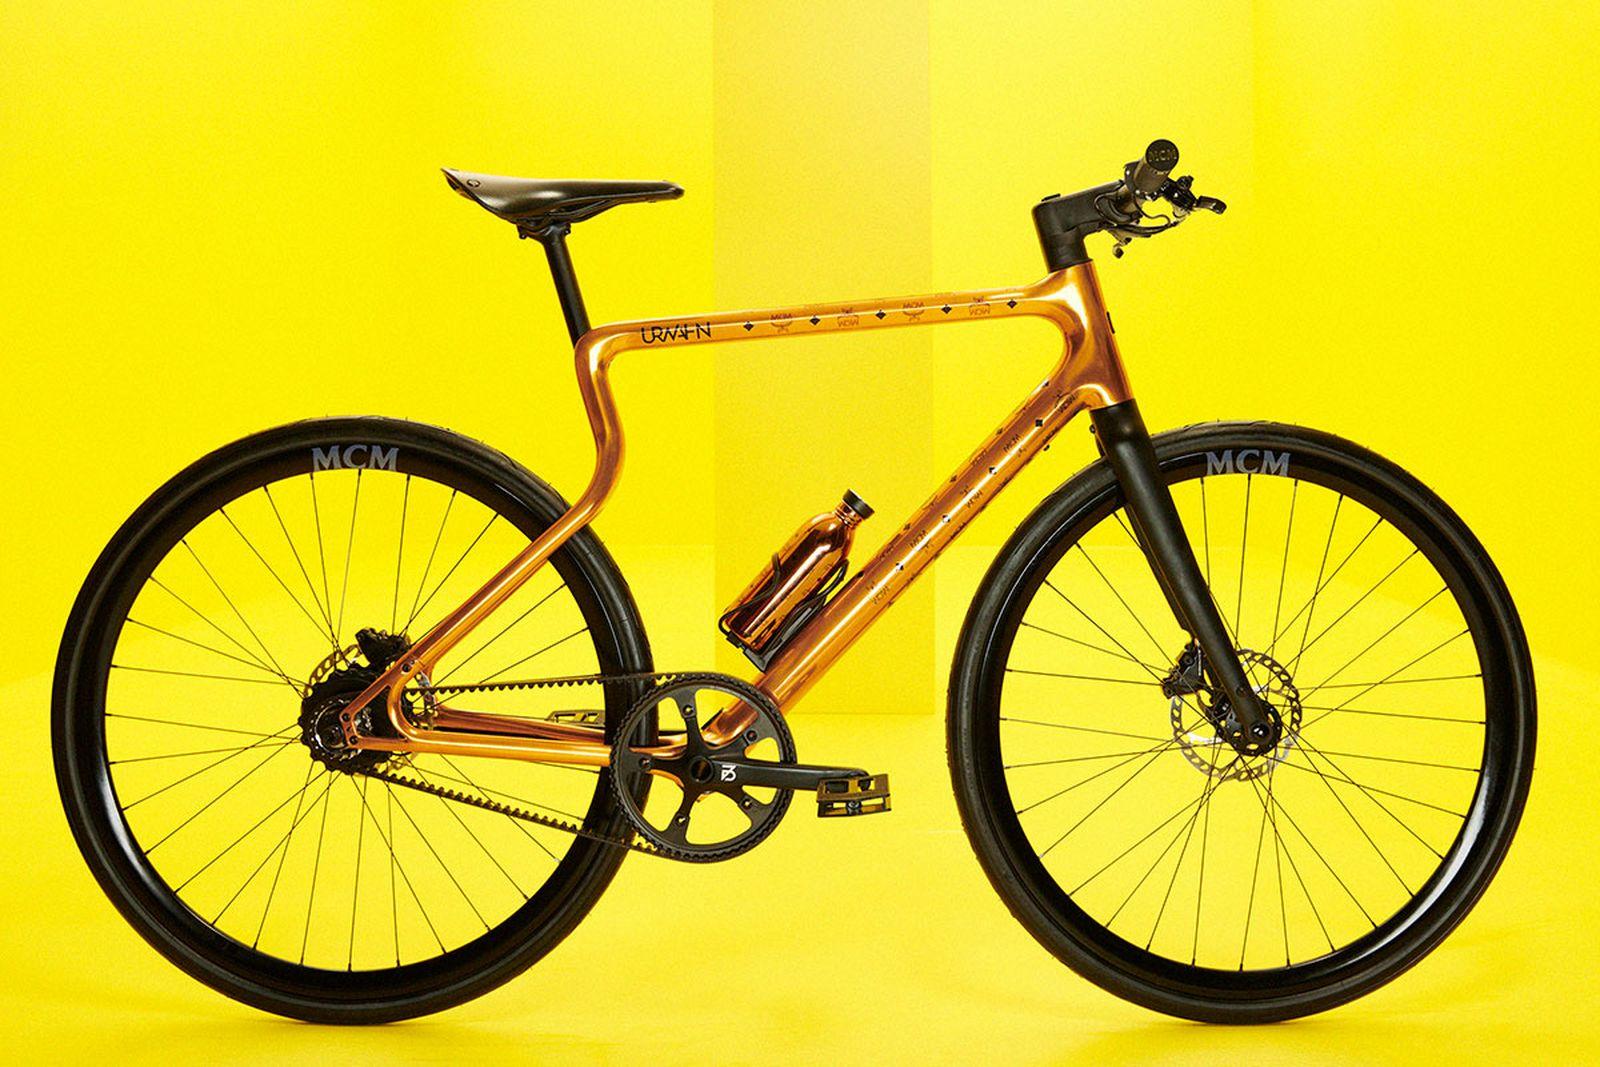 mcm-urwahn-e-bike-01